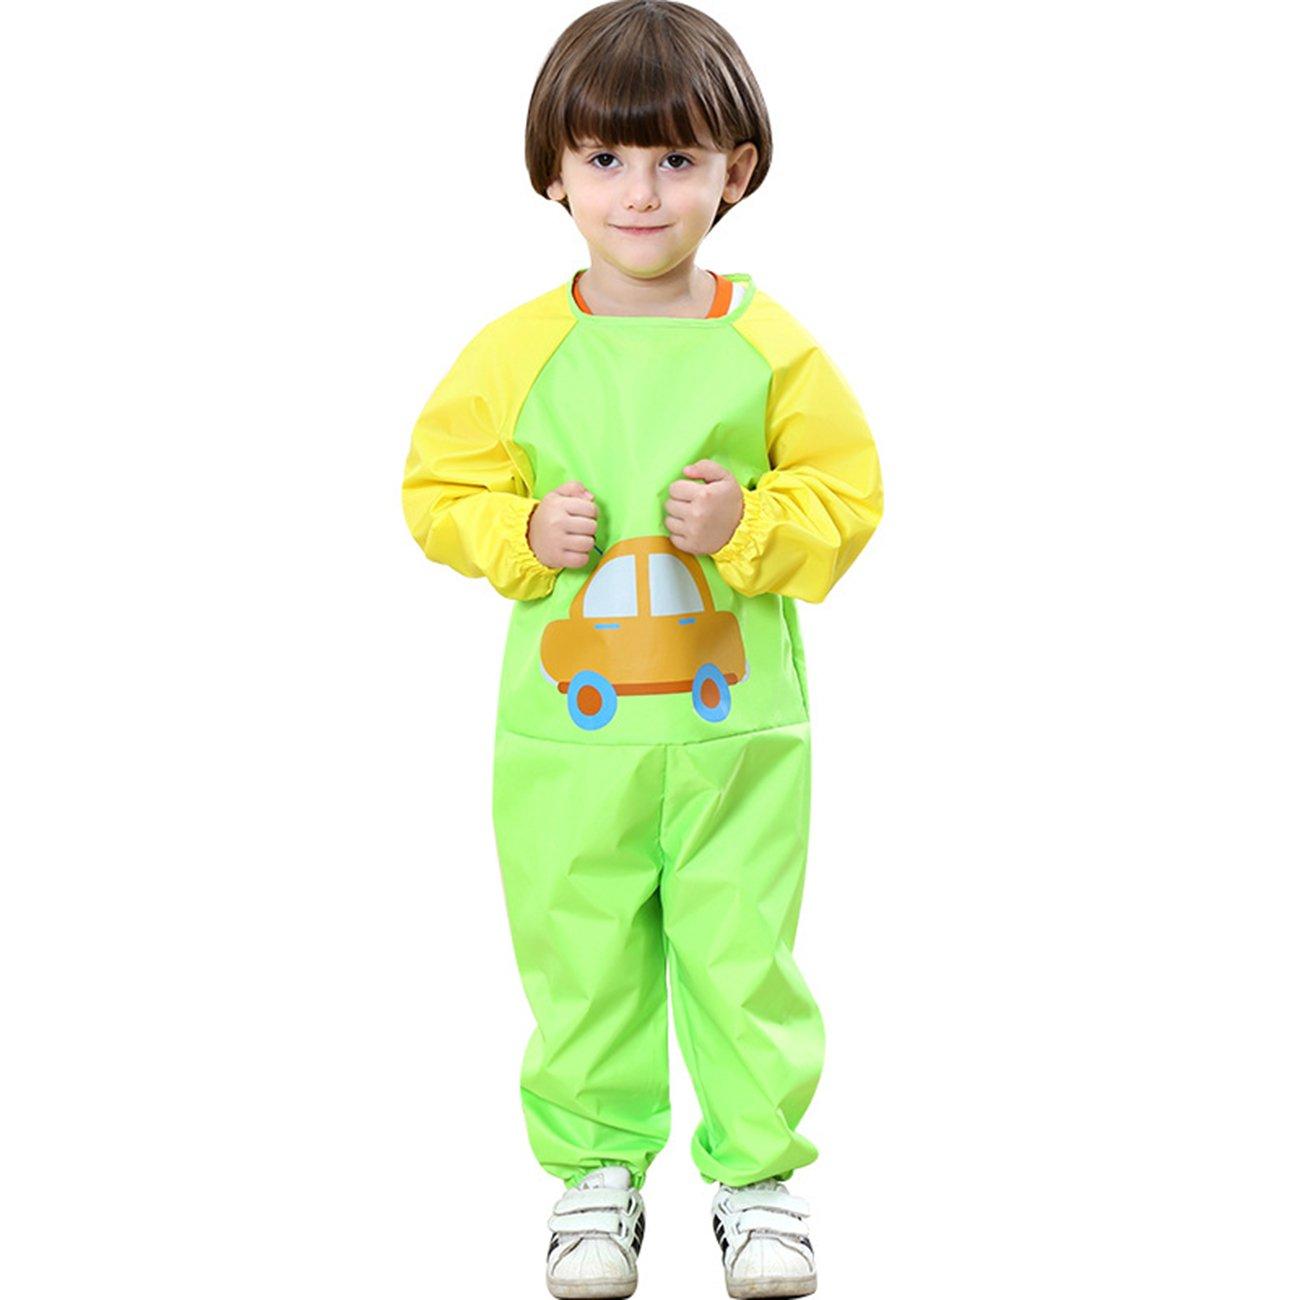 Boys/Girls Kids Waterproof Raincoat All in One Suit Kids Conjoined Raincoat,Green,M/Height:95-105cm/fit 3-5T